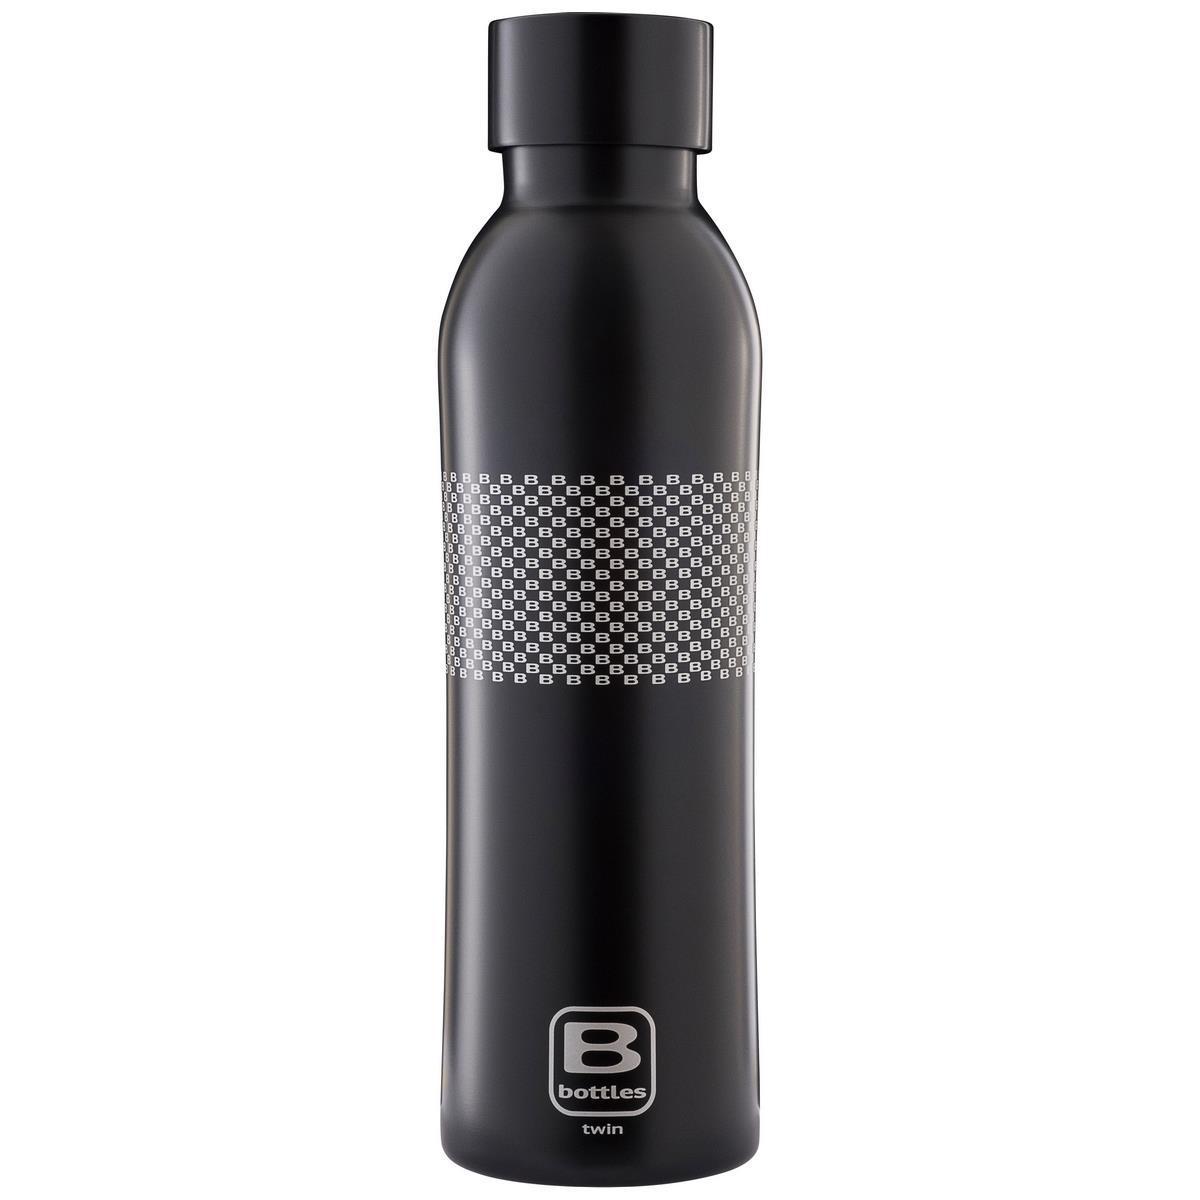 B Bottles Twin - B Pattern - 500 ml - Bottiglia Termica a doppia parete in acciaio inox 18/10